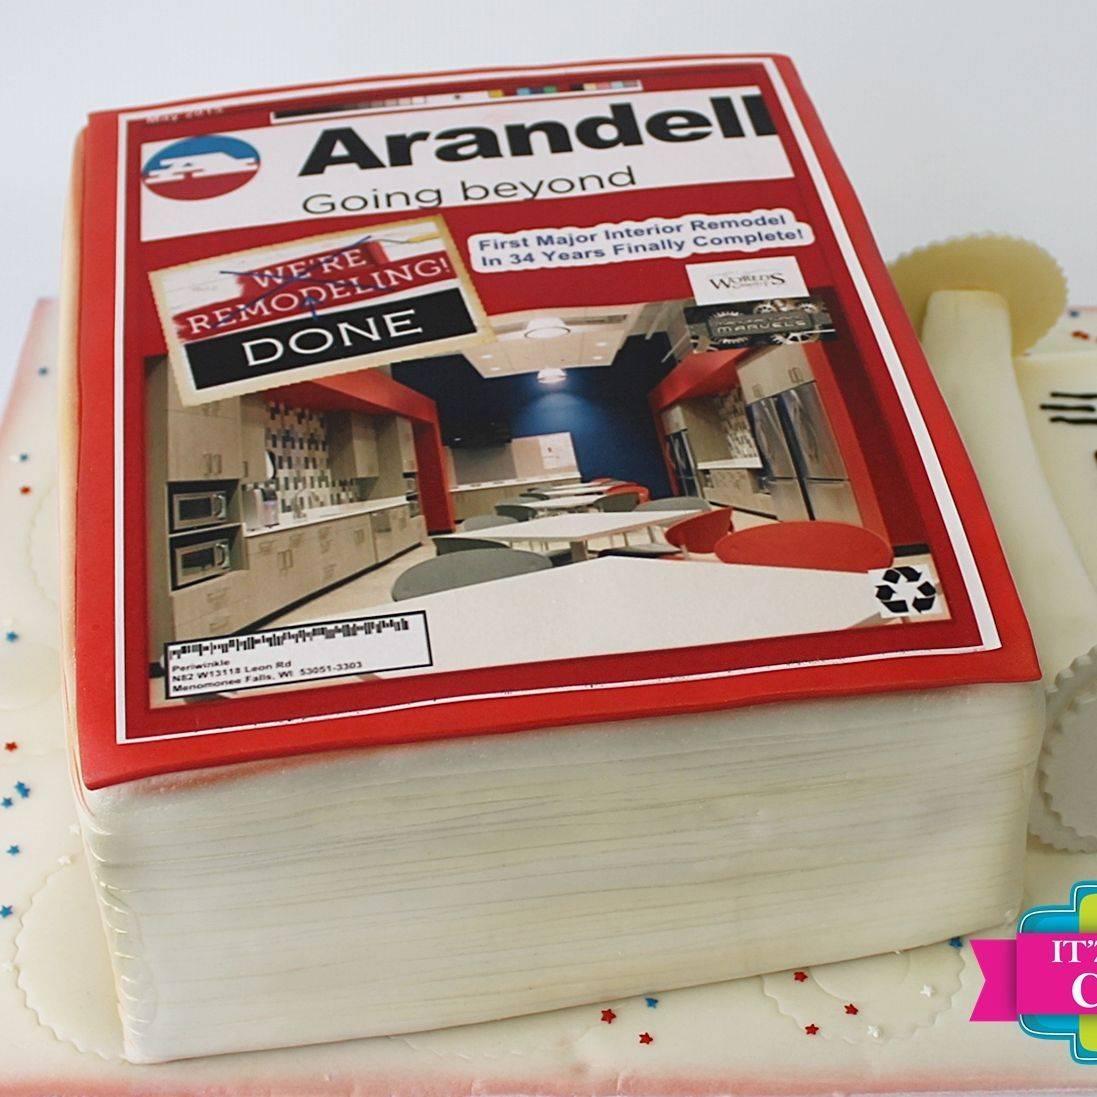 Arandell Cake Dimensional Cake Milwaukee